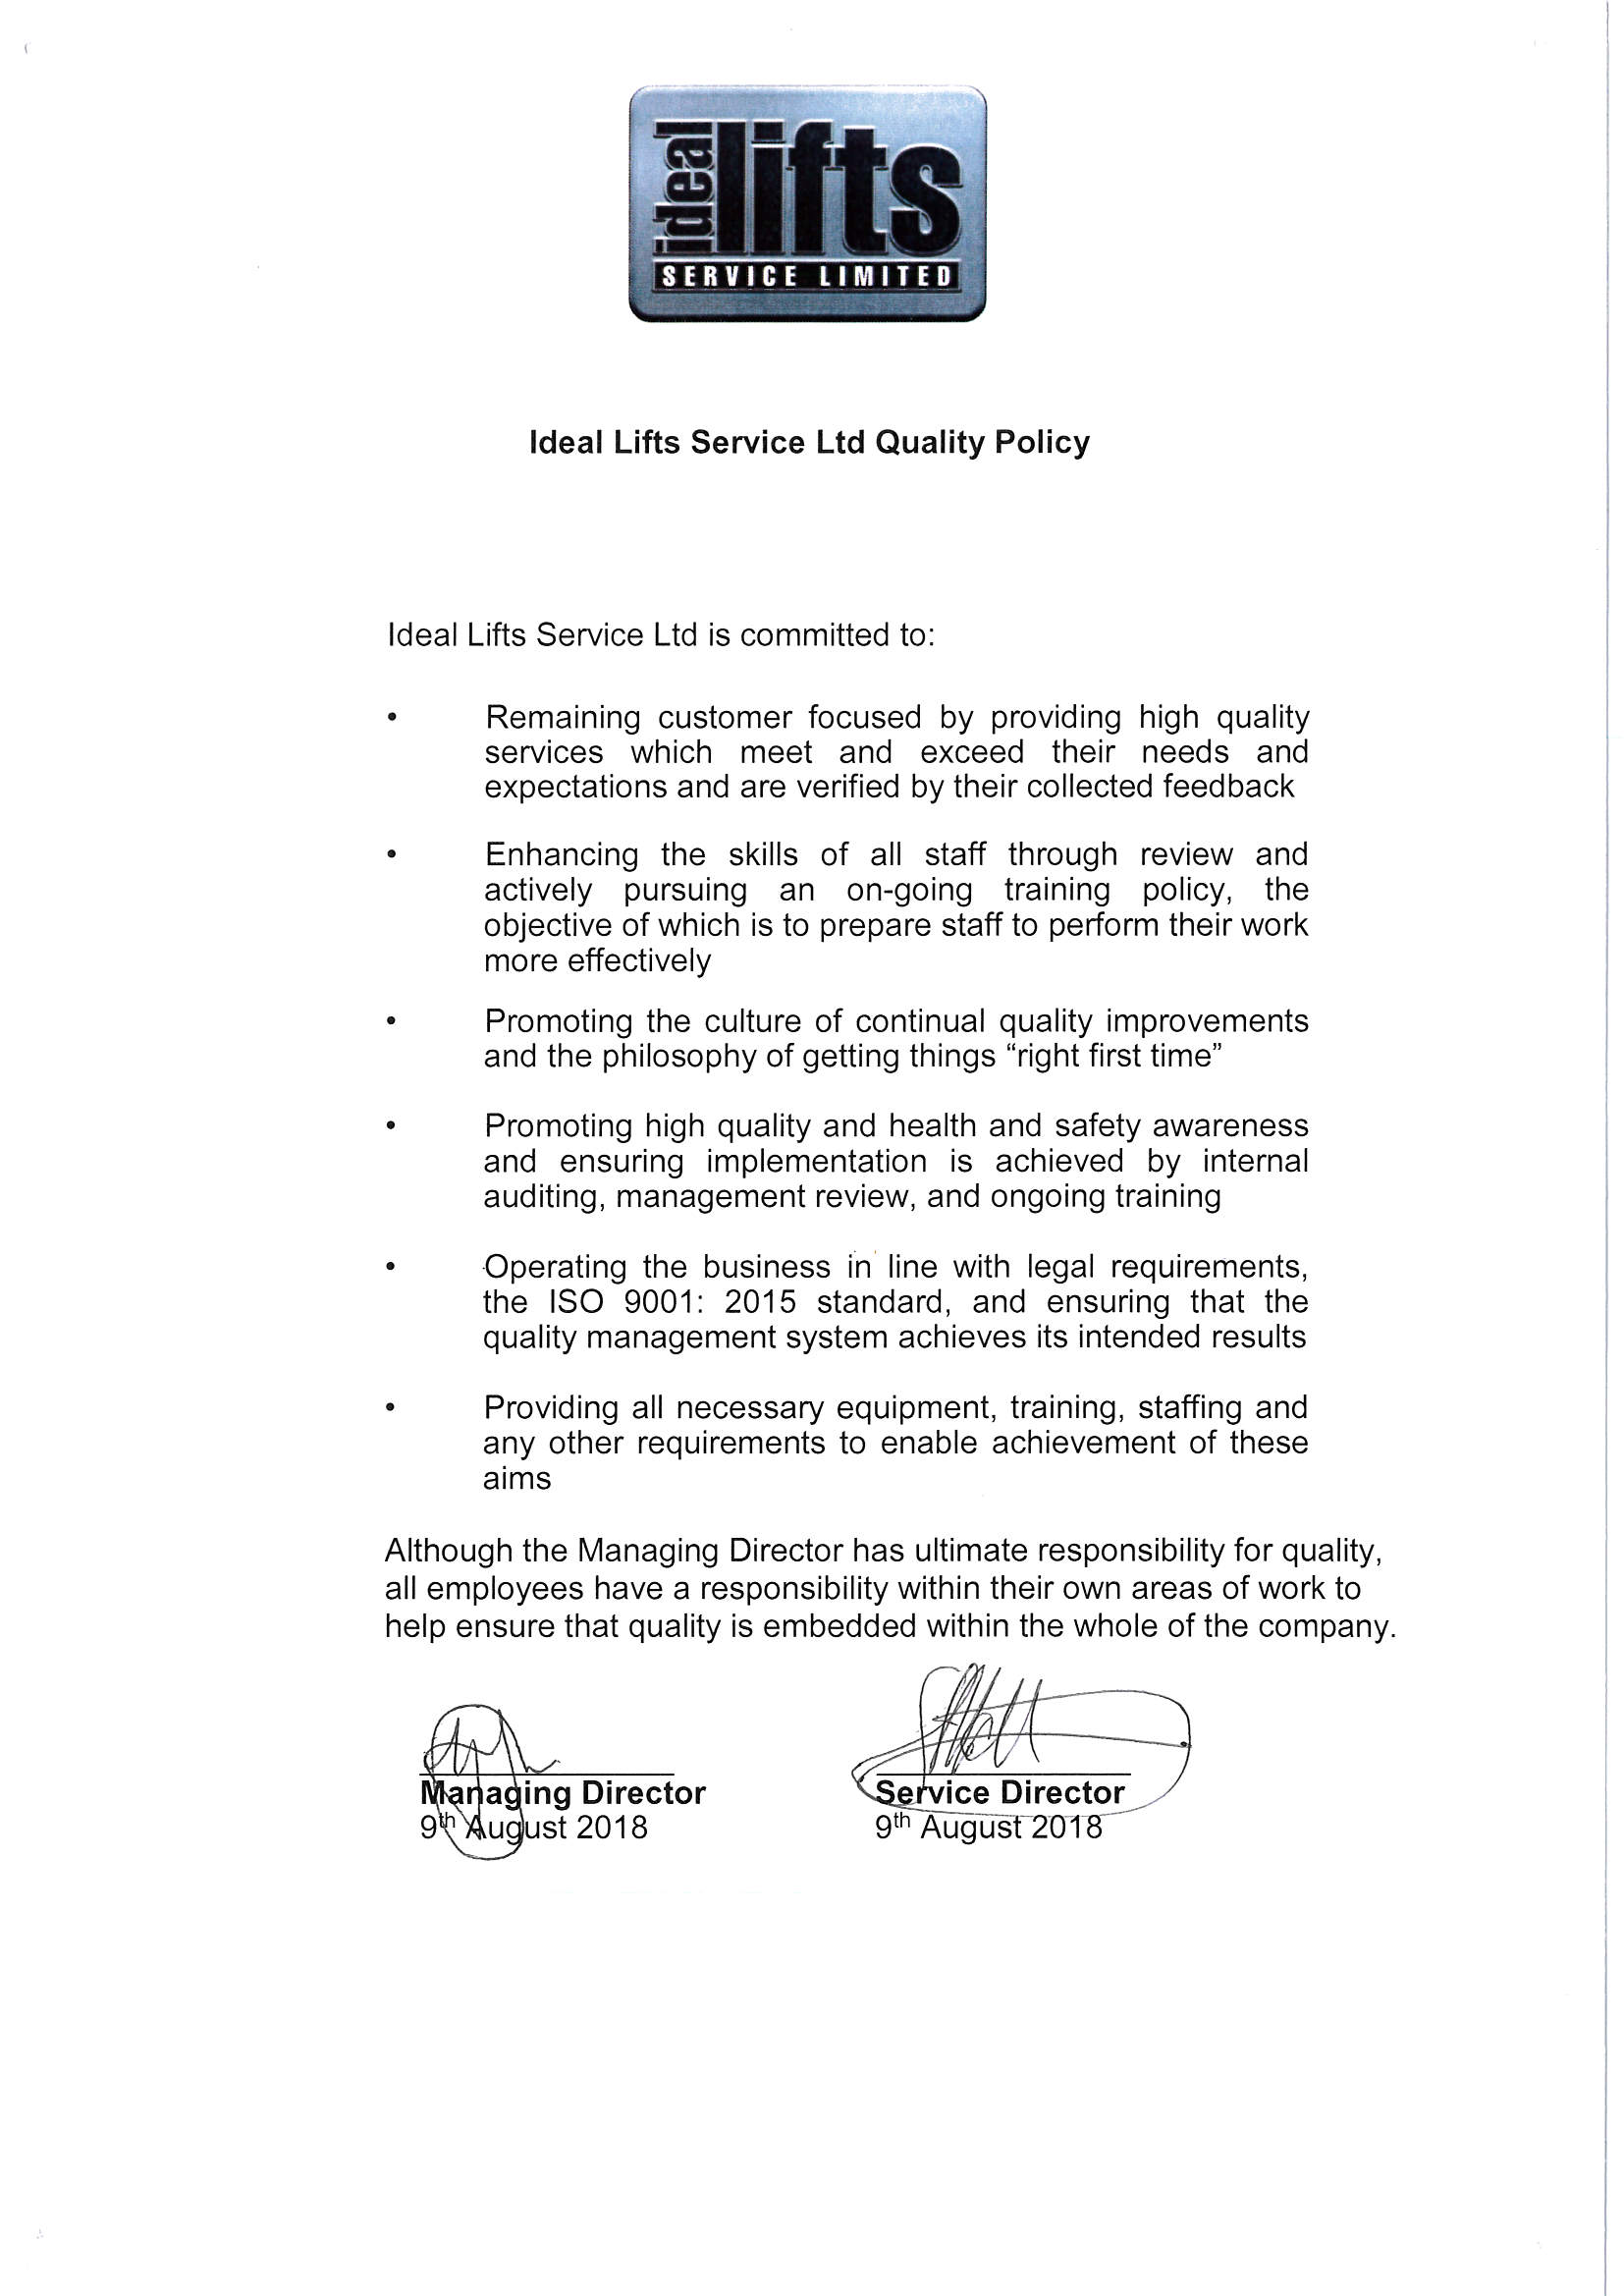 IDLS Quality Policy